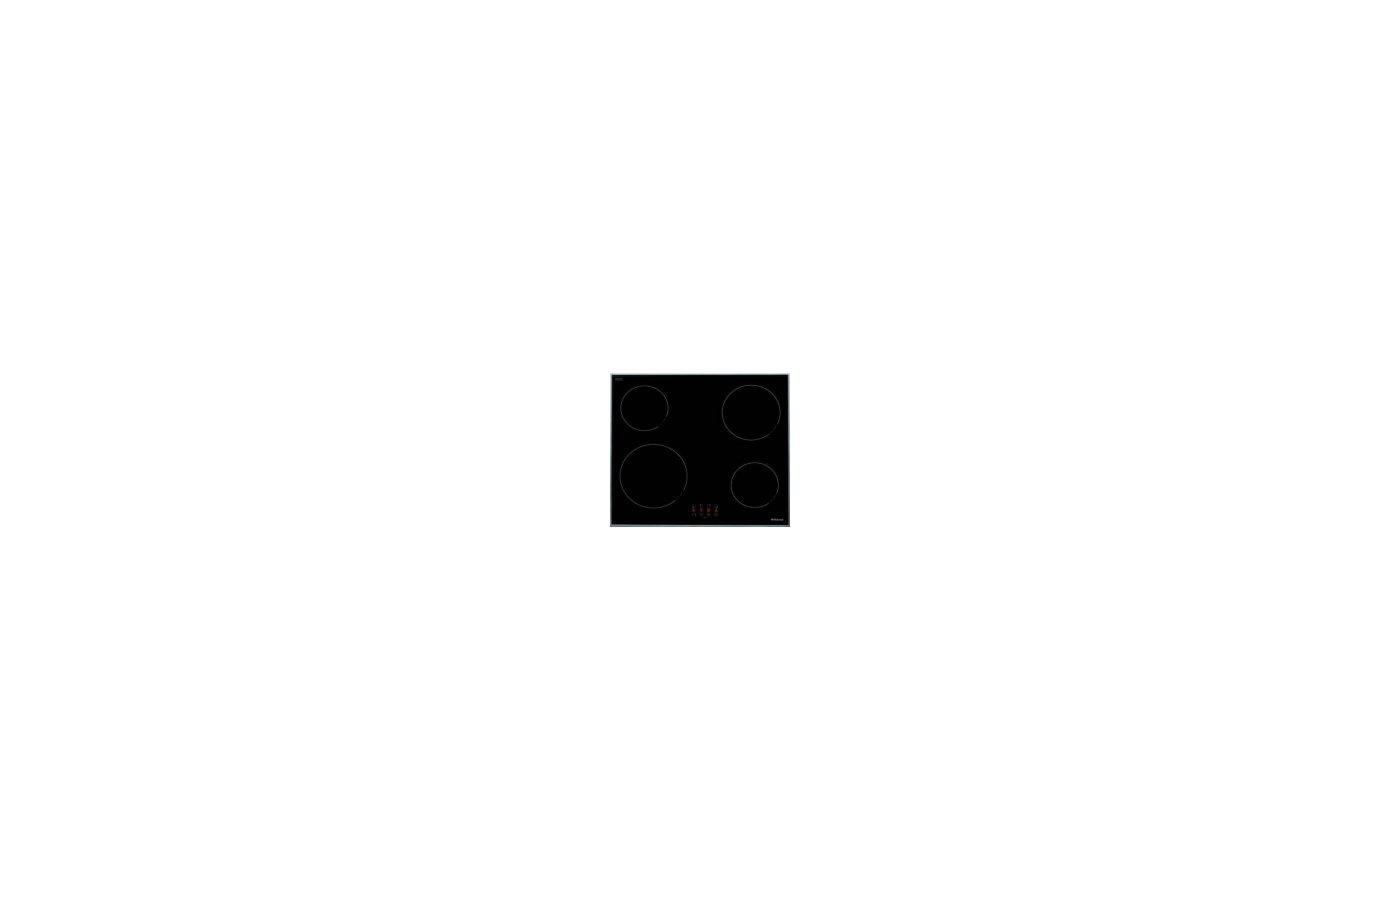 Варочная панель HANSA BHCI 63306